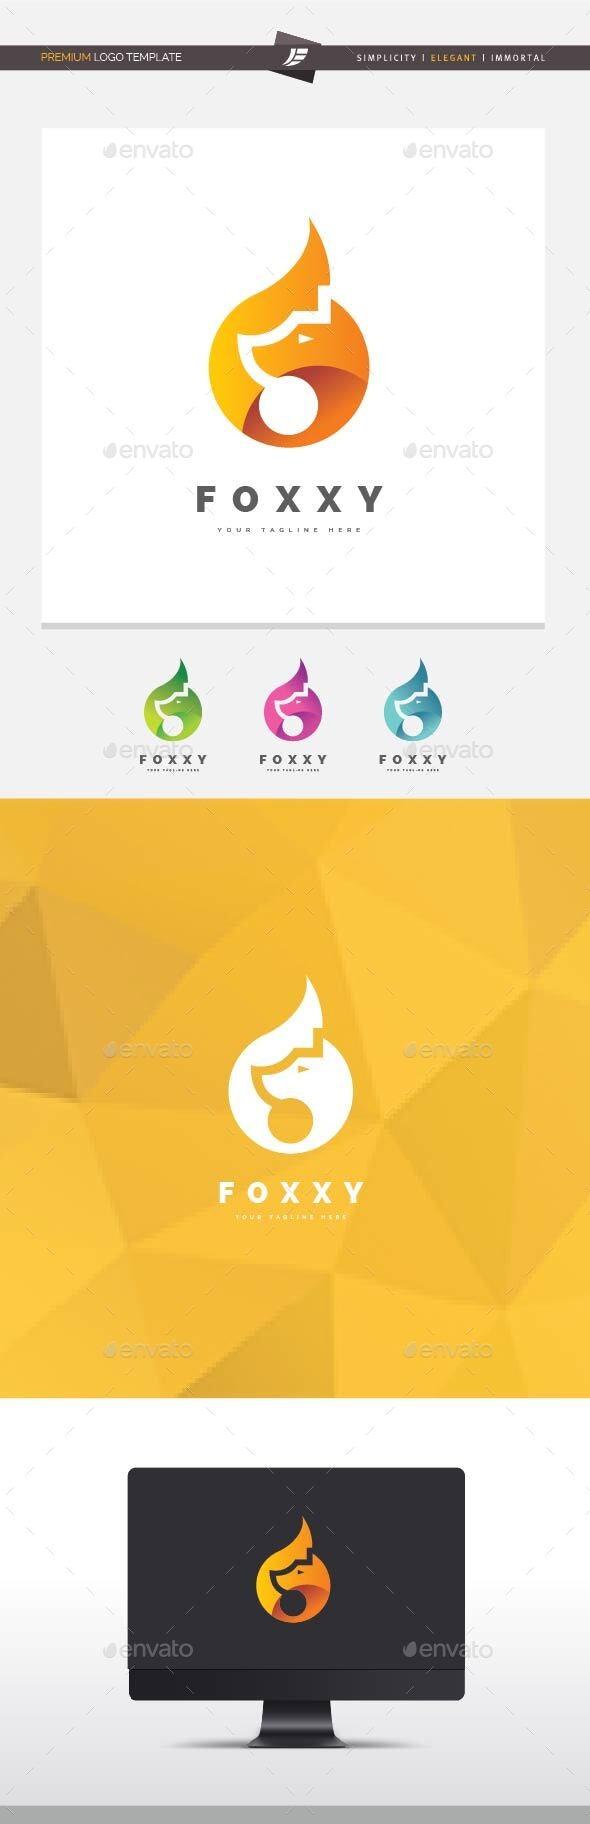 Foxxy Logo - Animals Logo Templates